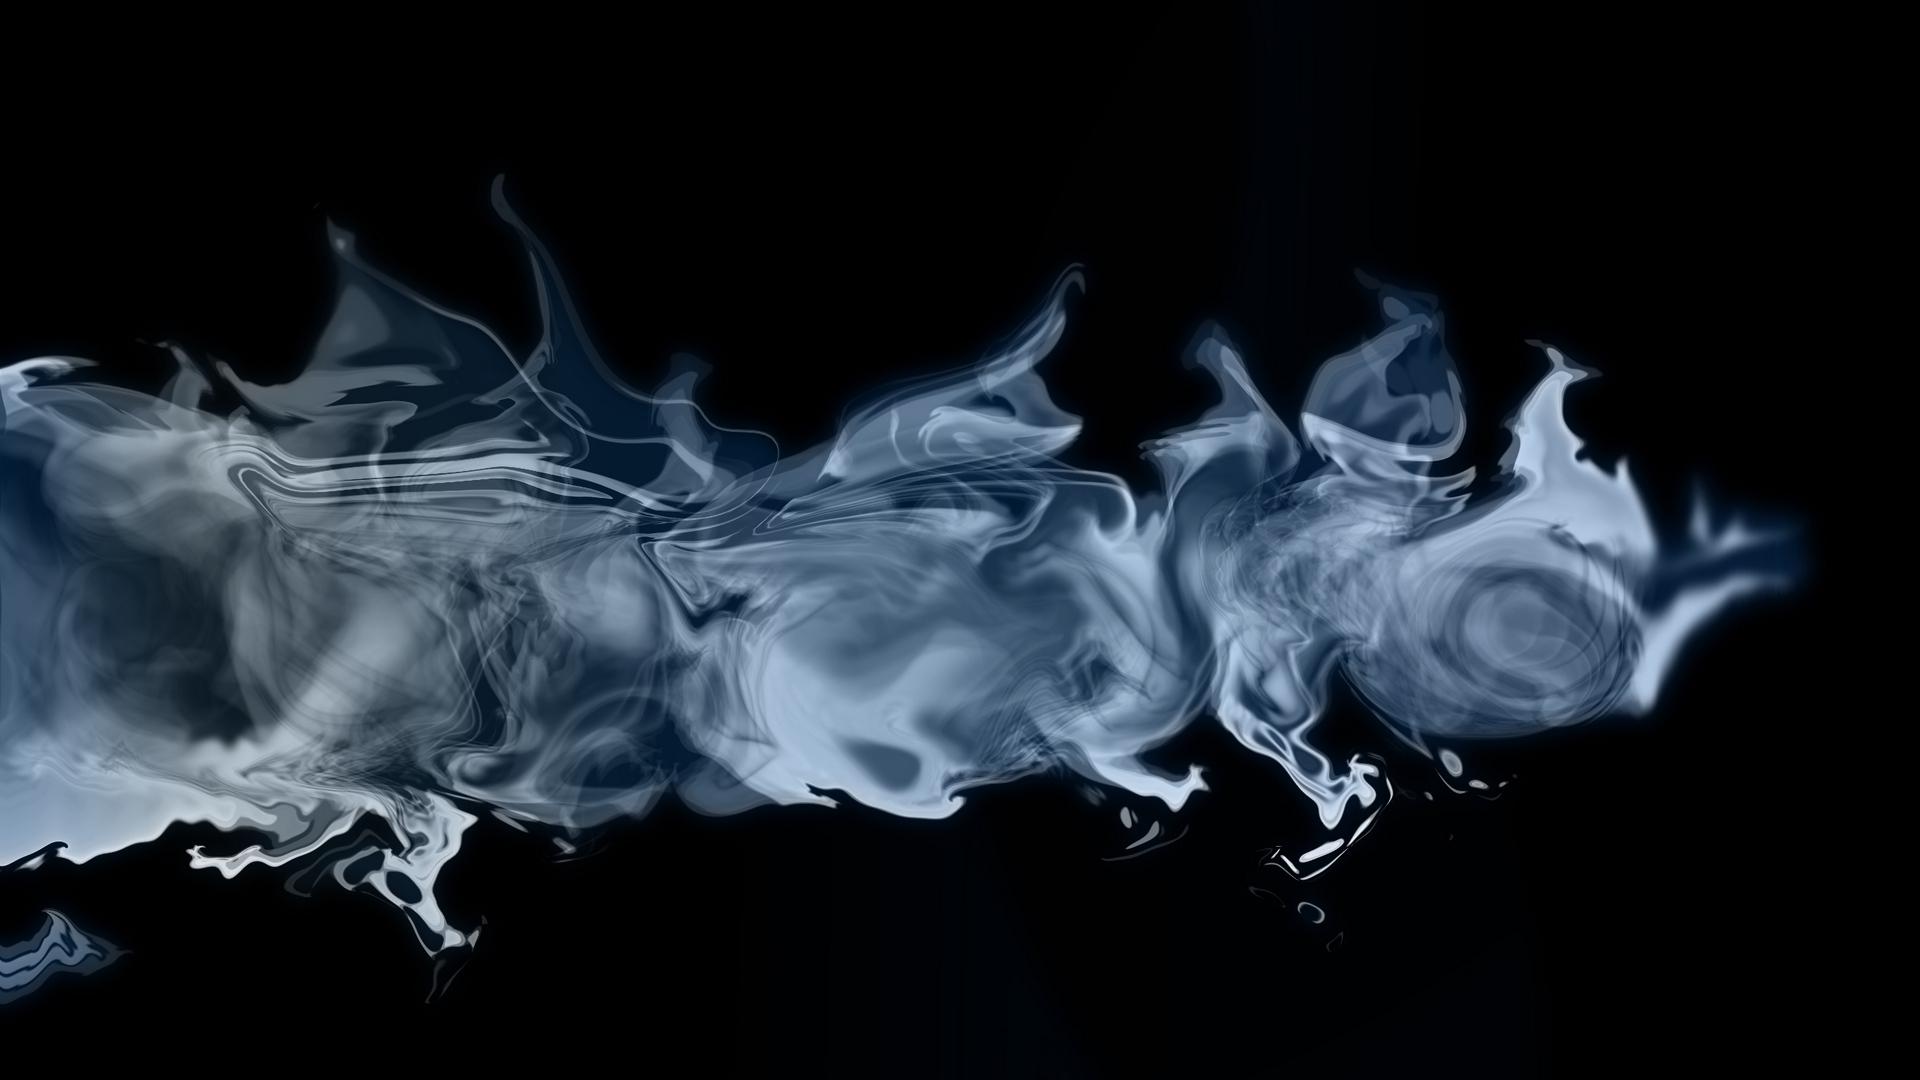 Download wallpaper 1920x1080 black, gray, smoke full hd, hdtv, fhd ...